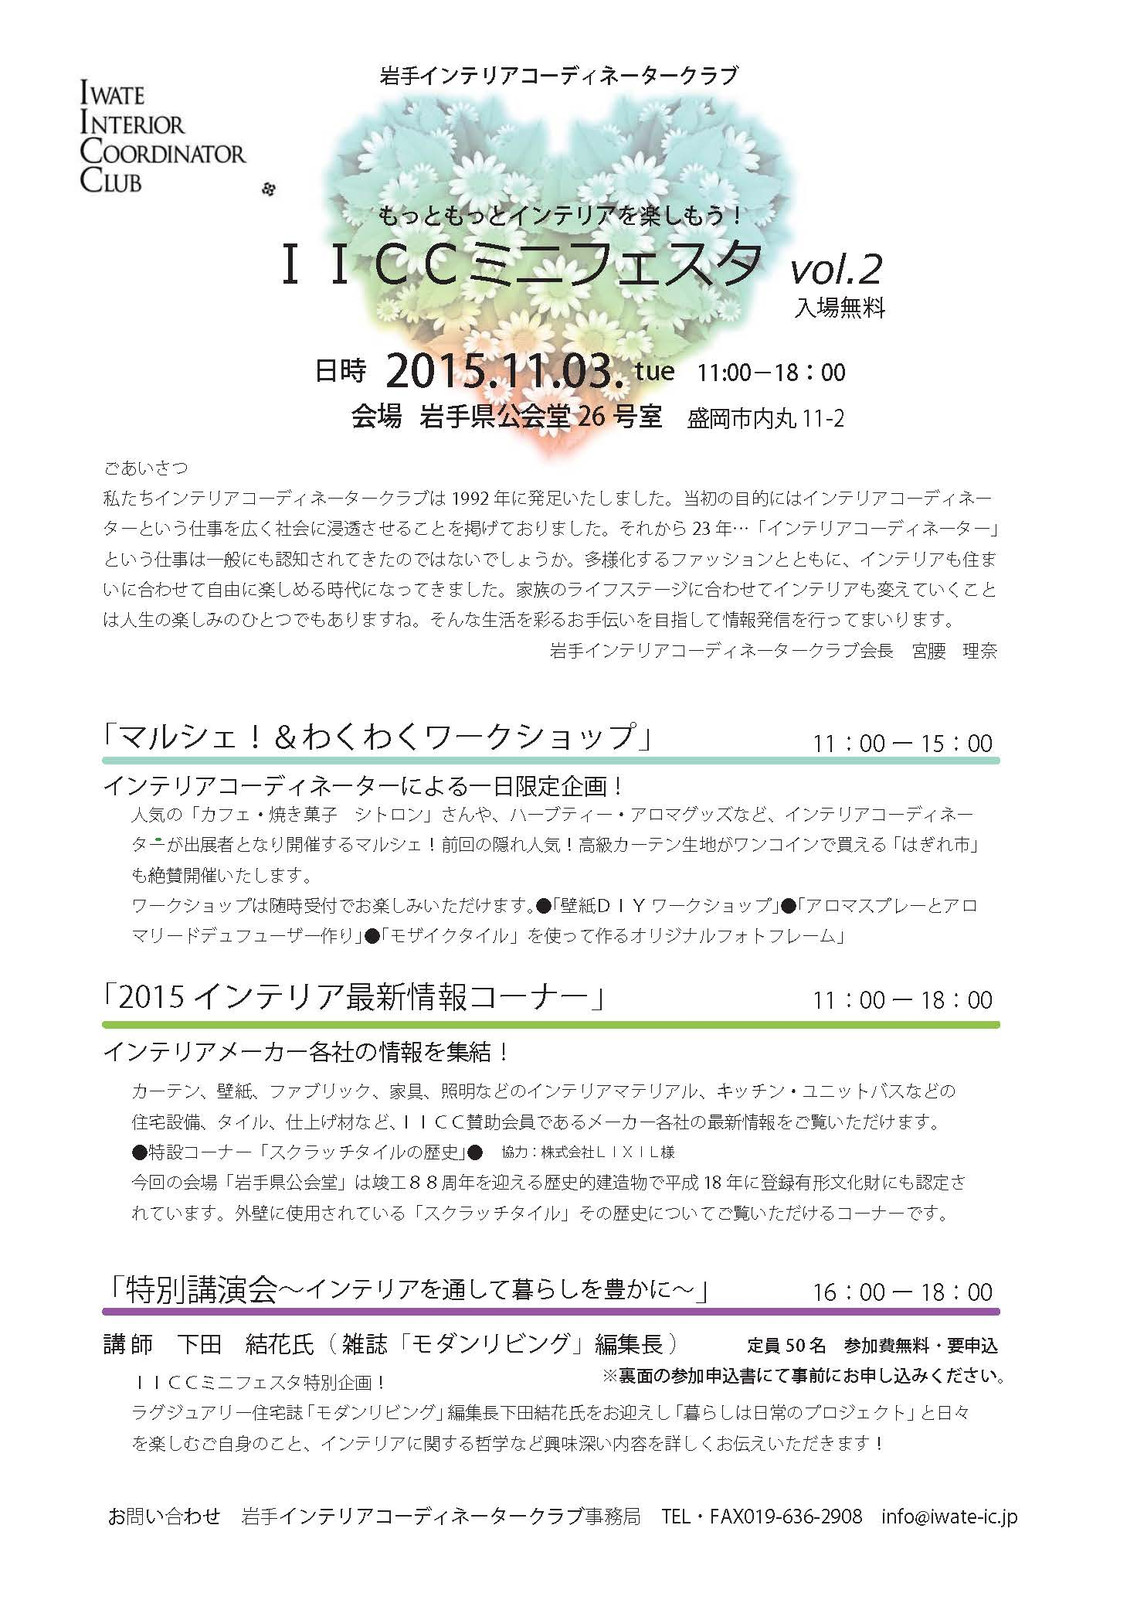 Iicc_vol2